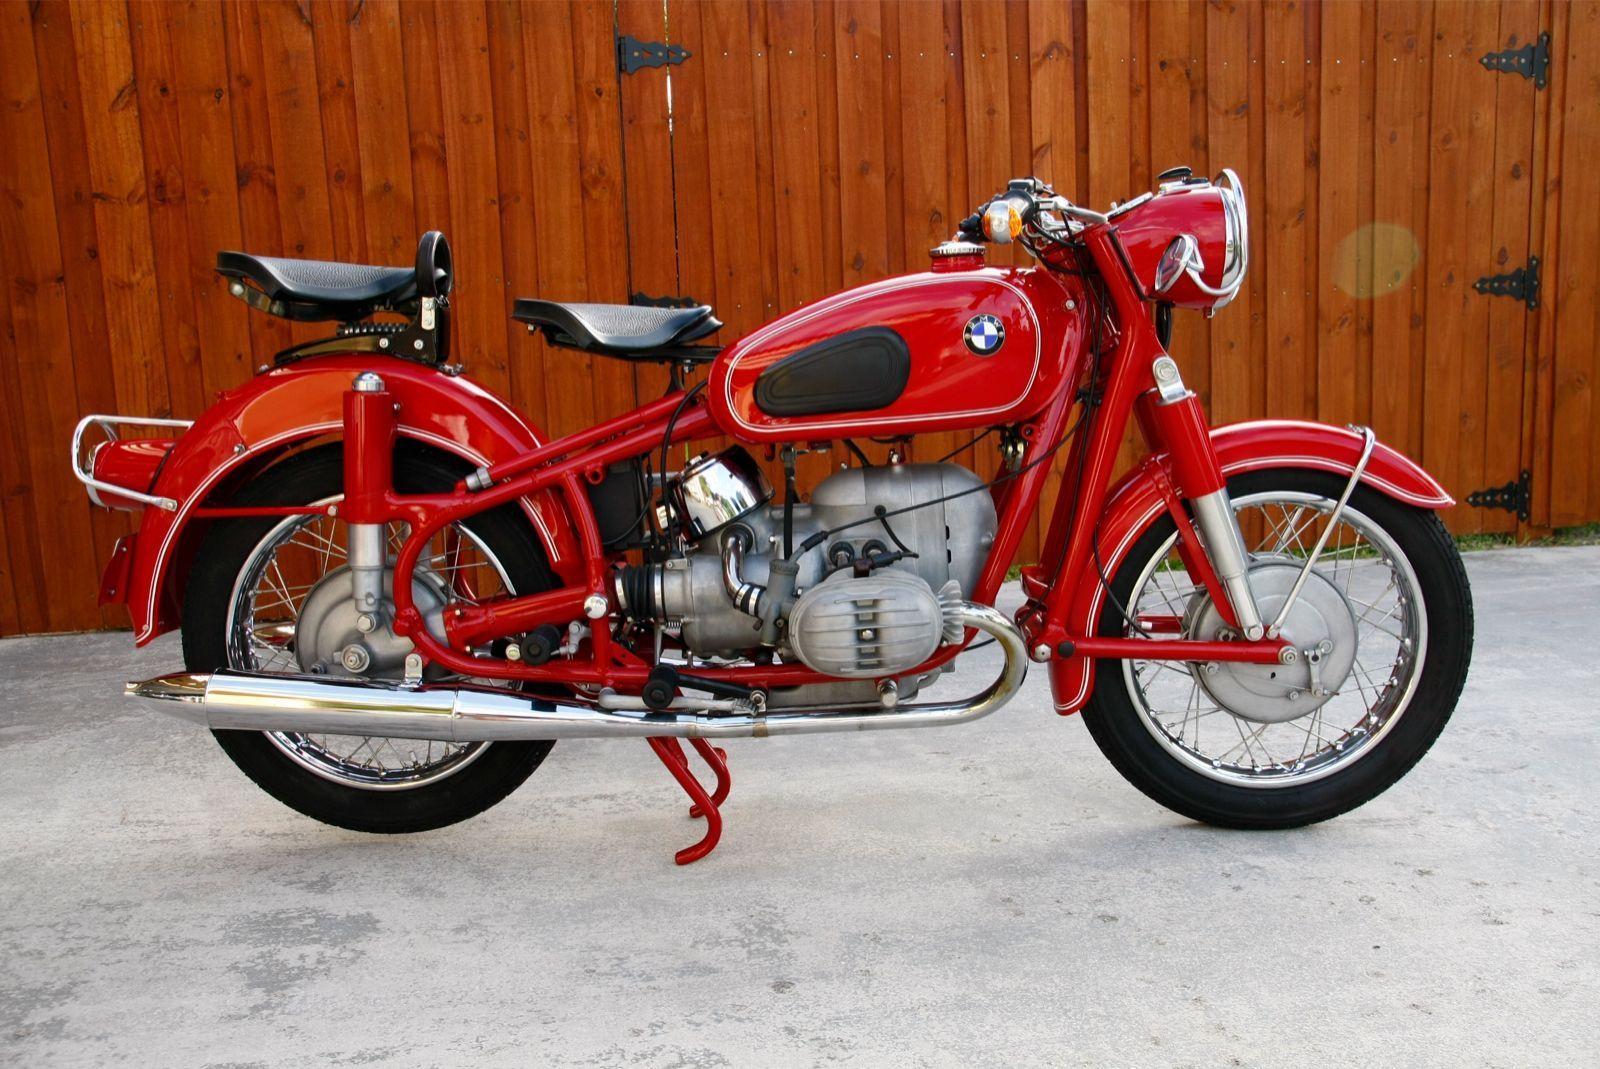 restored bmw r60 2 1966 photographs at classic bikes. Black Bedroom Furniture Sets. Home Design Ideas